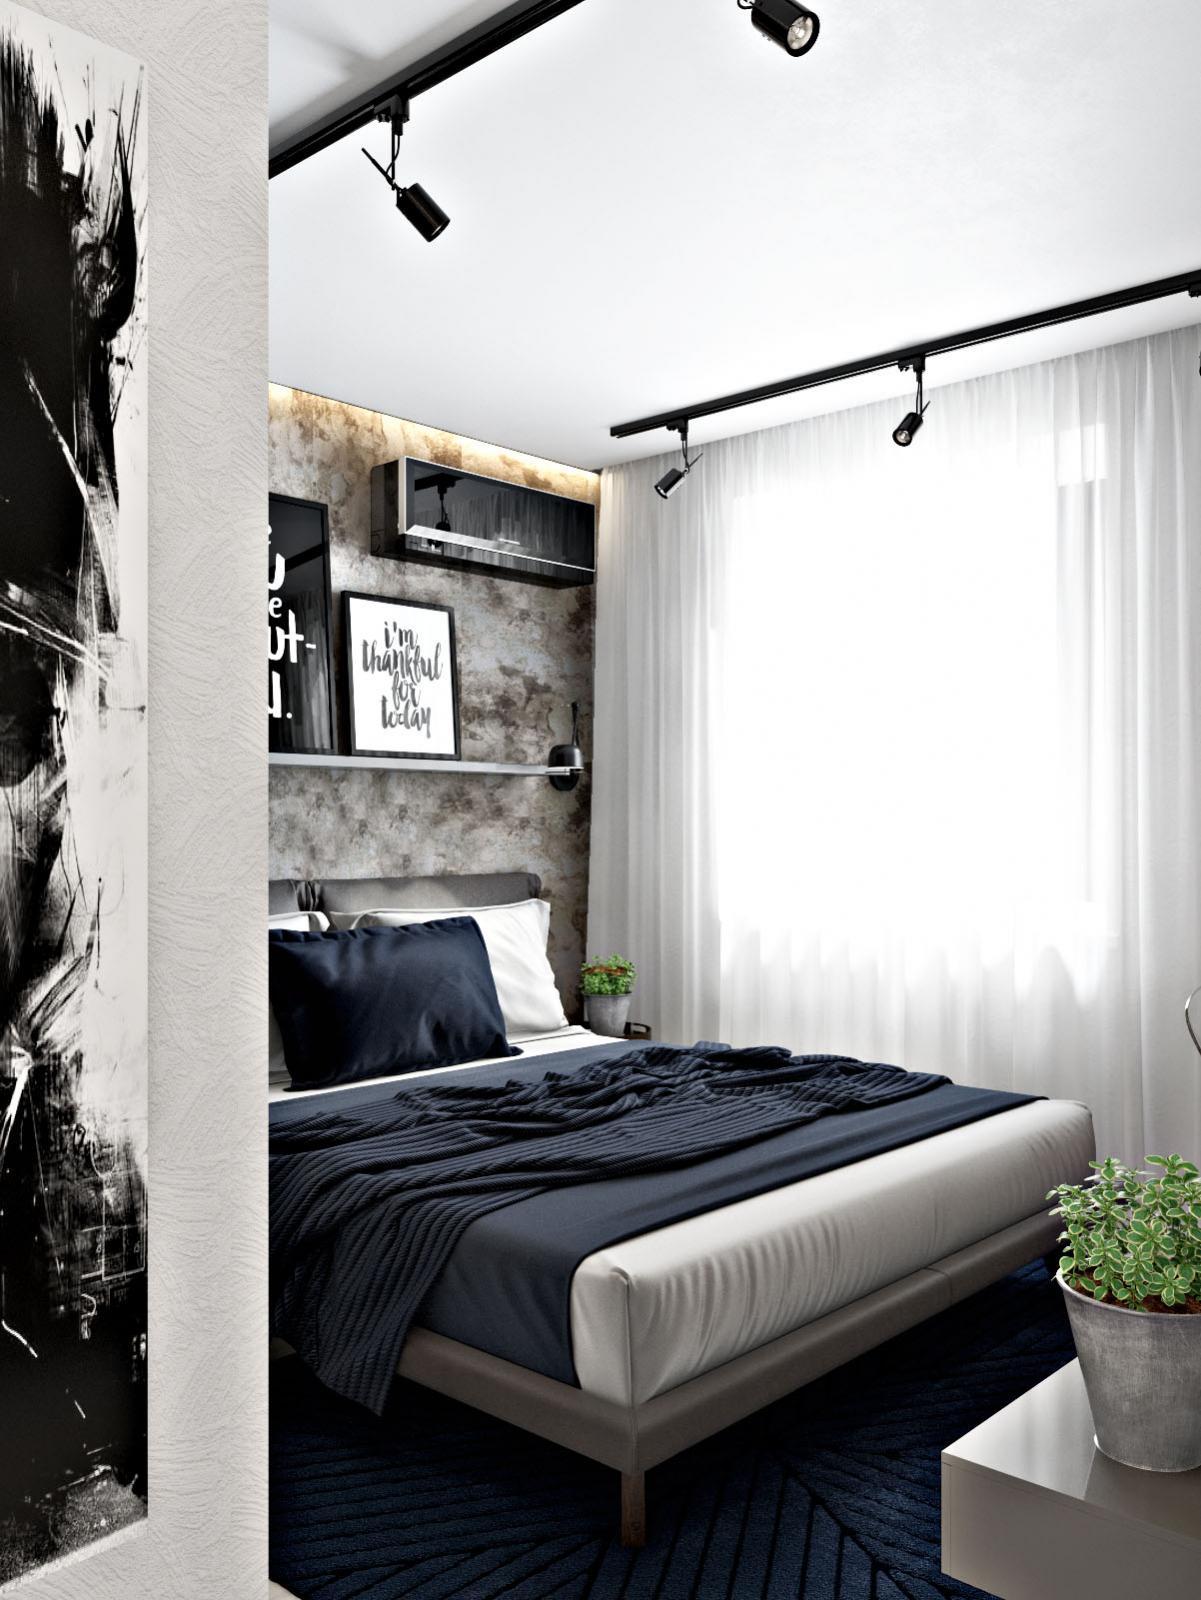 Интерьер двухкомнатной квартиры в ЖК Пляж